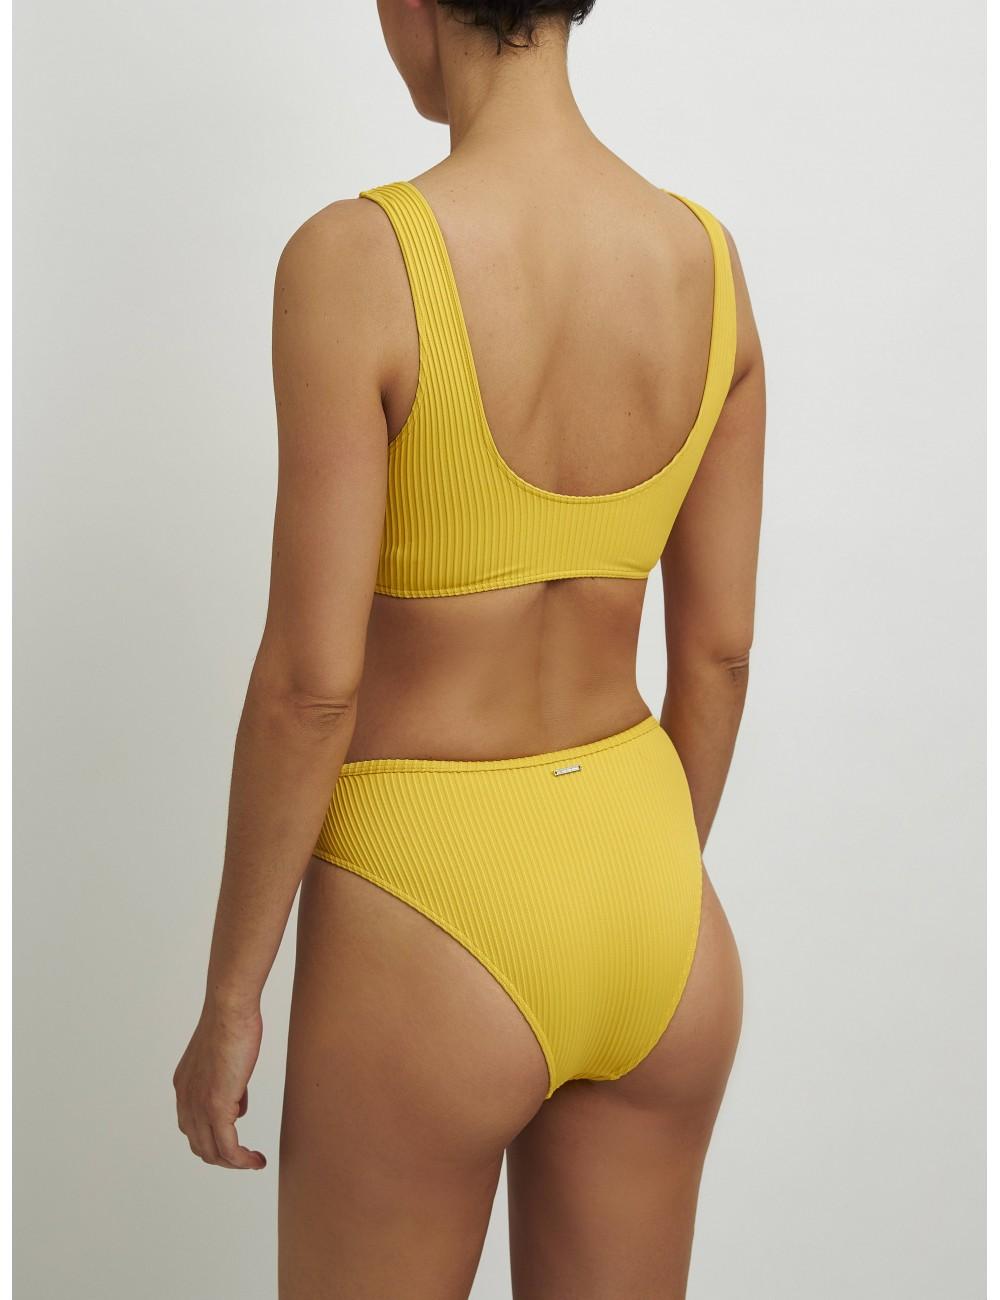 Braga bikini cruzada amarilla